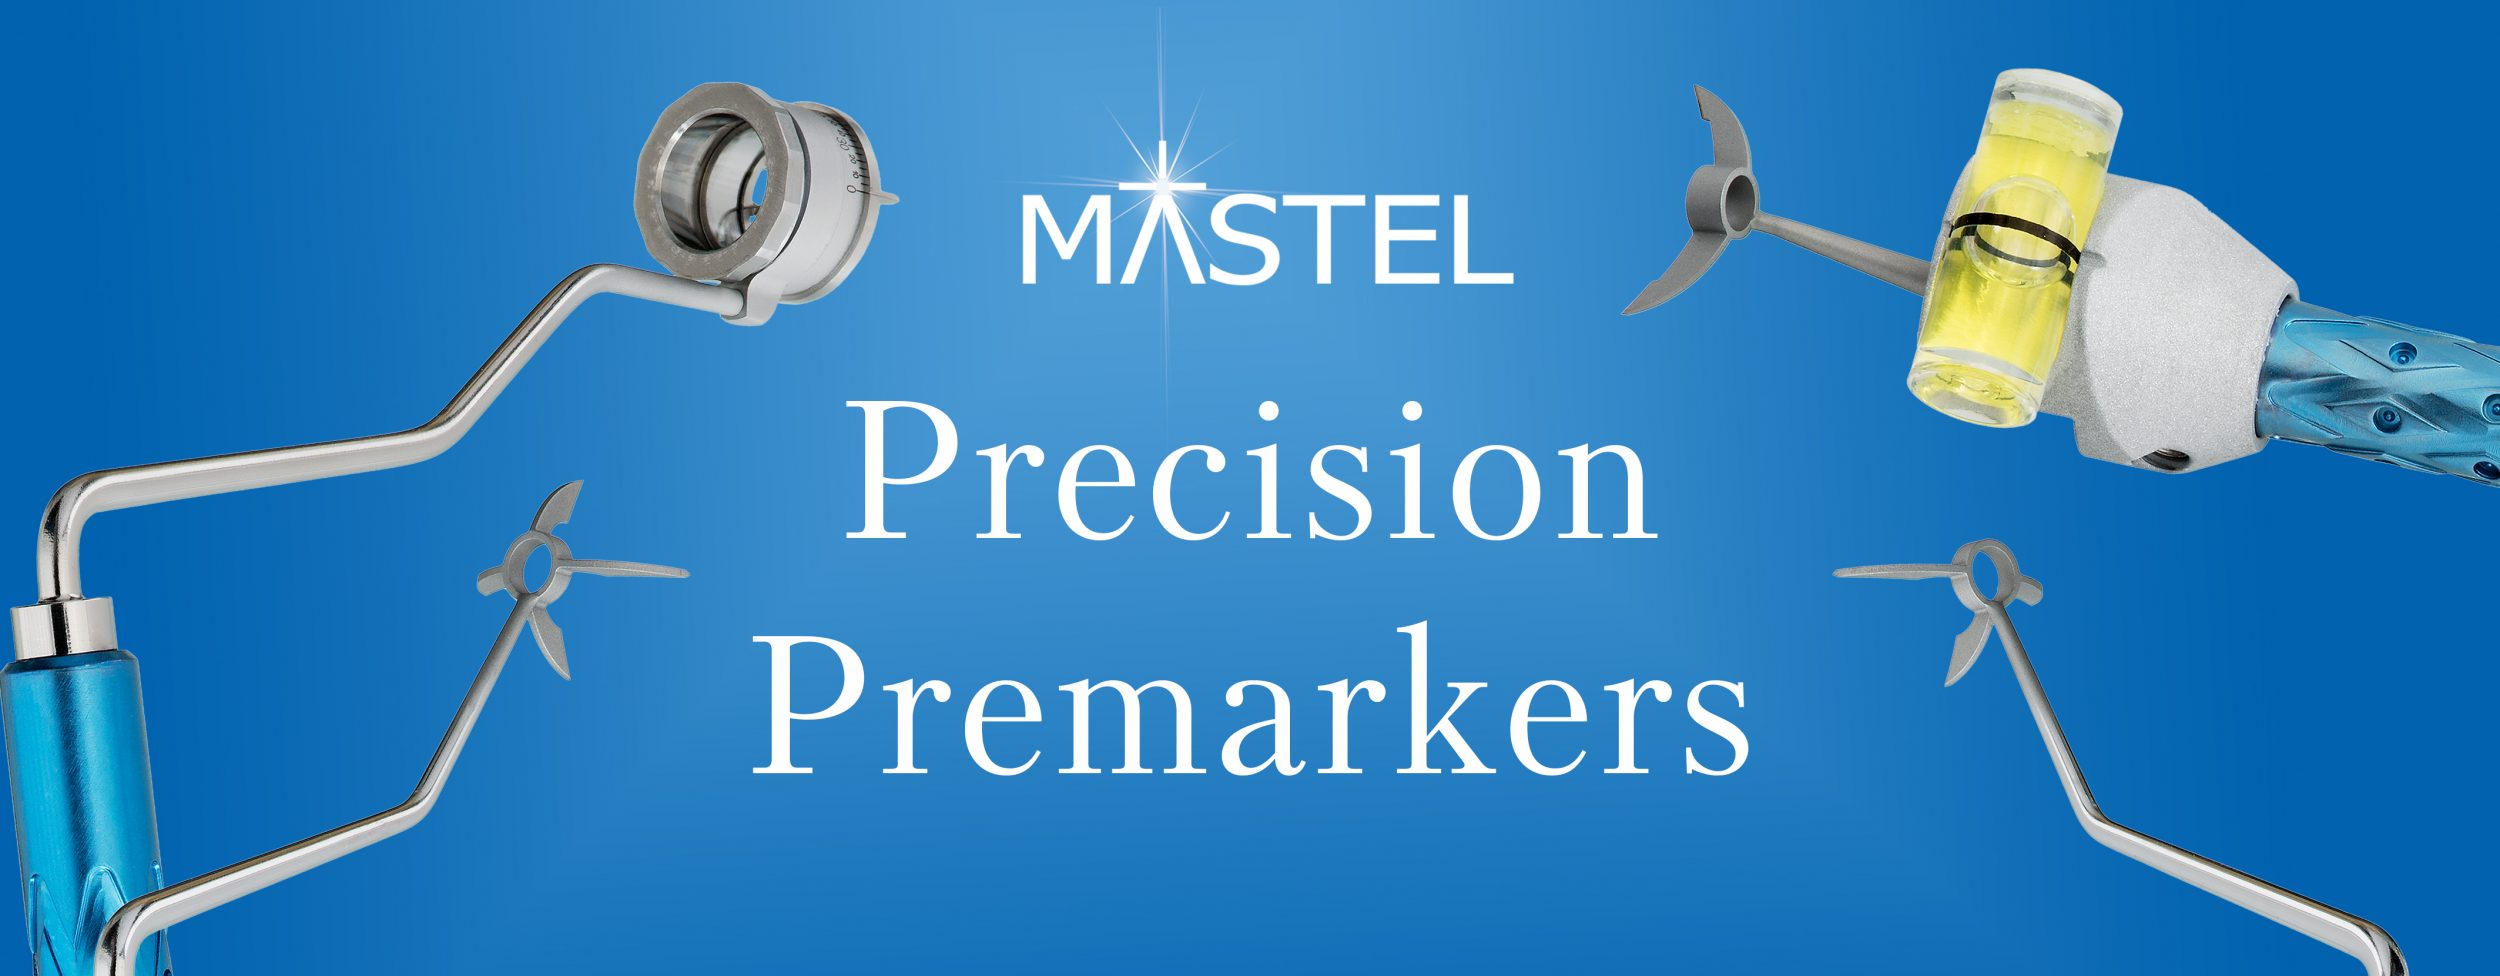 Premarkers Banner